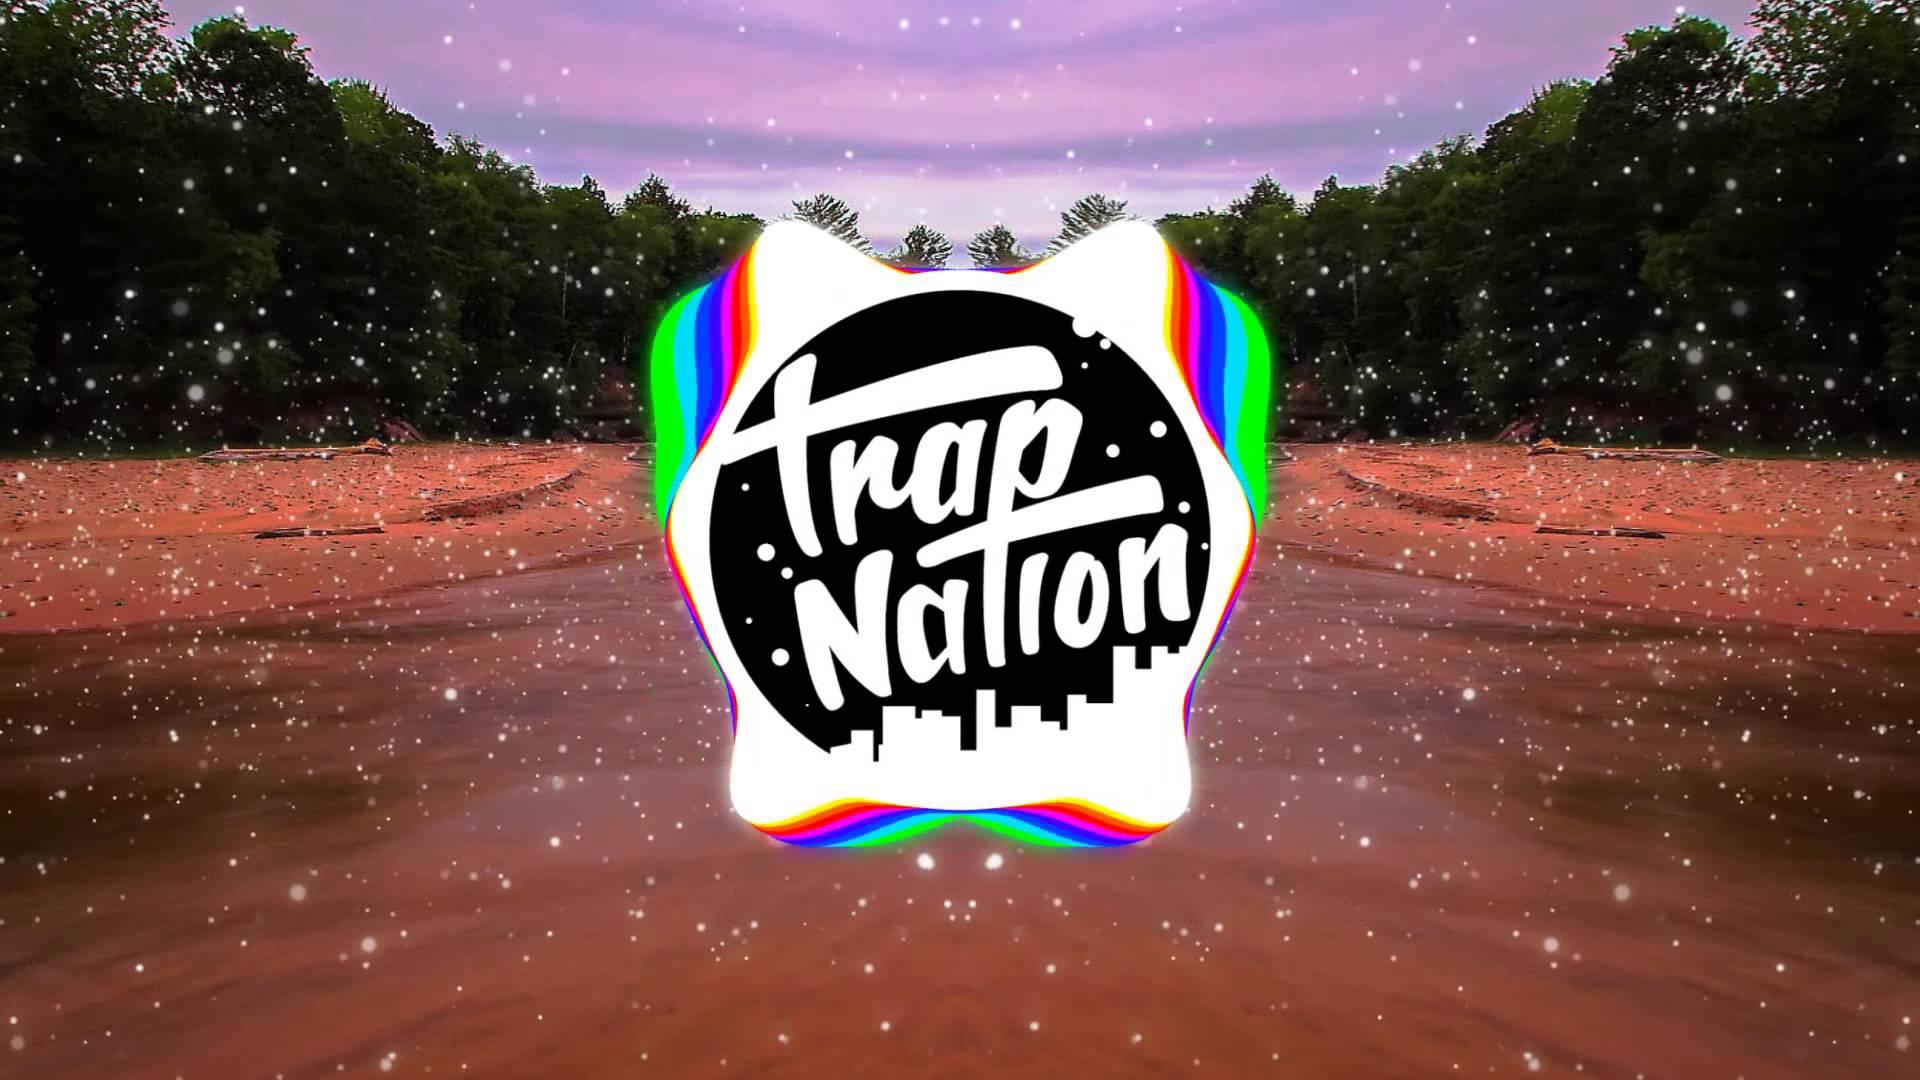 Tove Lo - Stay High ft. Hippie Sabotage (U$IK Trap Remix) Специально для Kirenga-smi